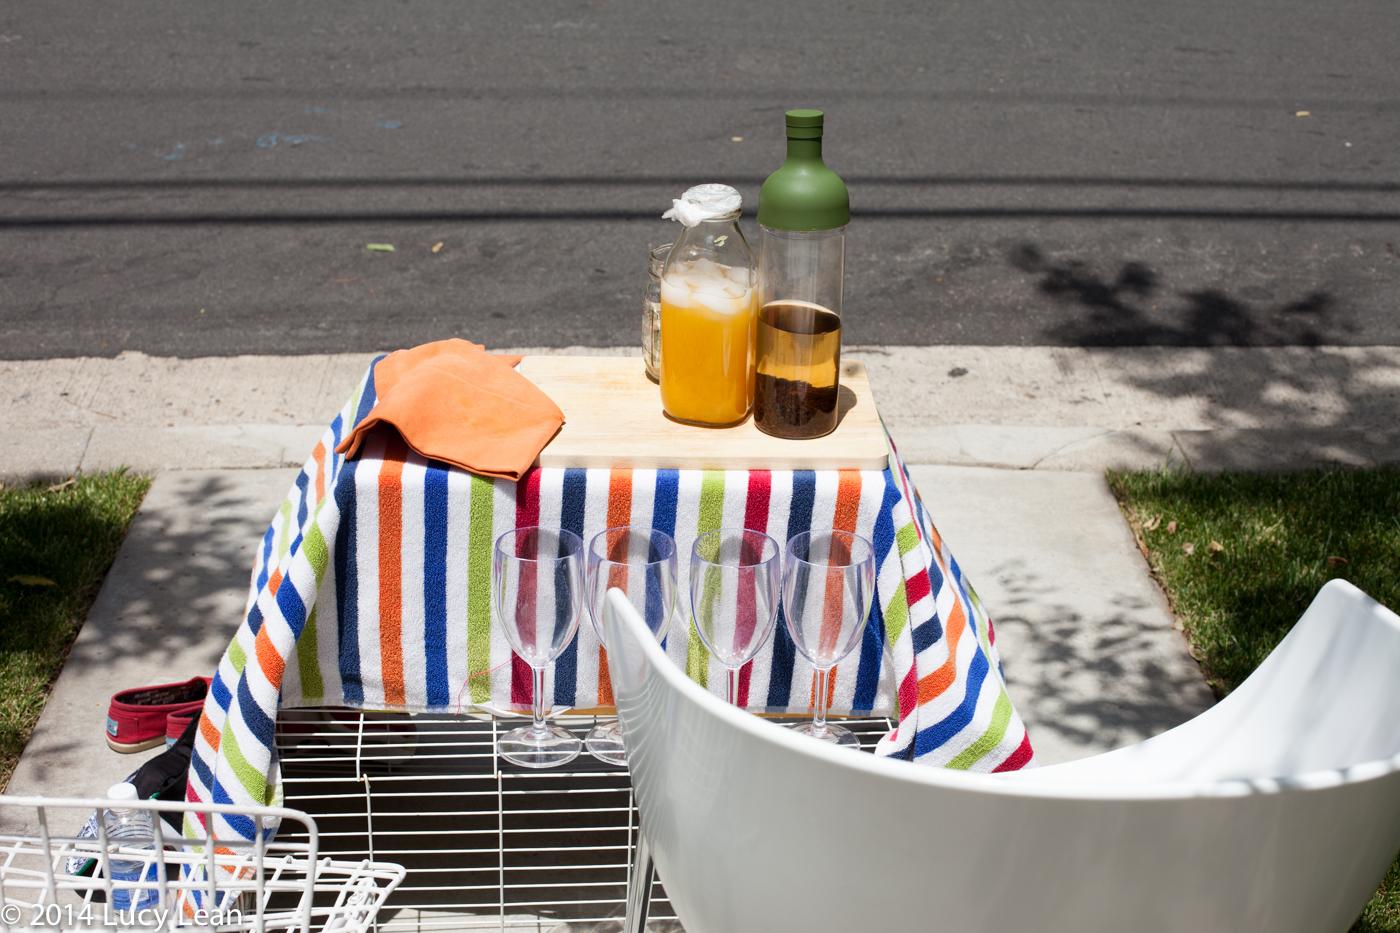 orangeade and iced tea stand